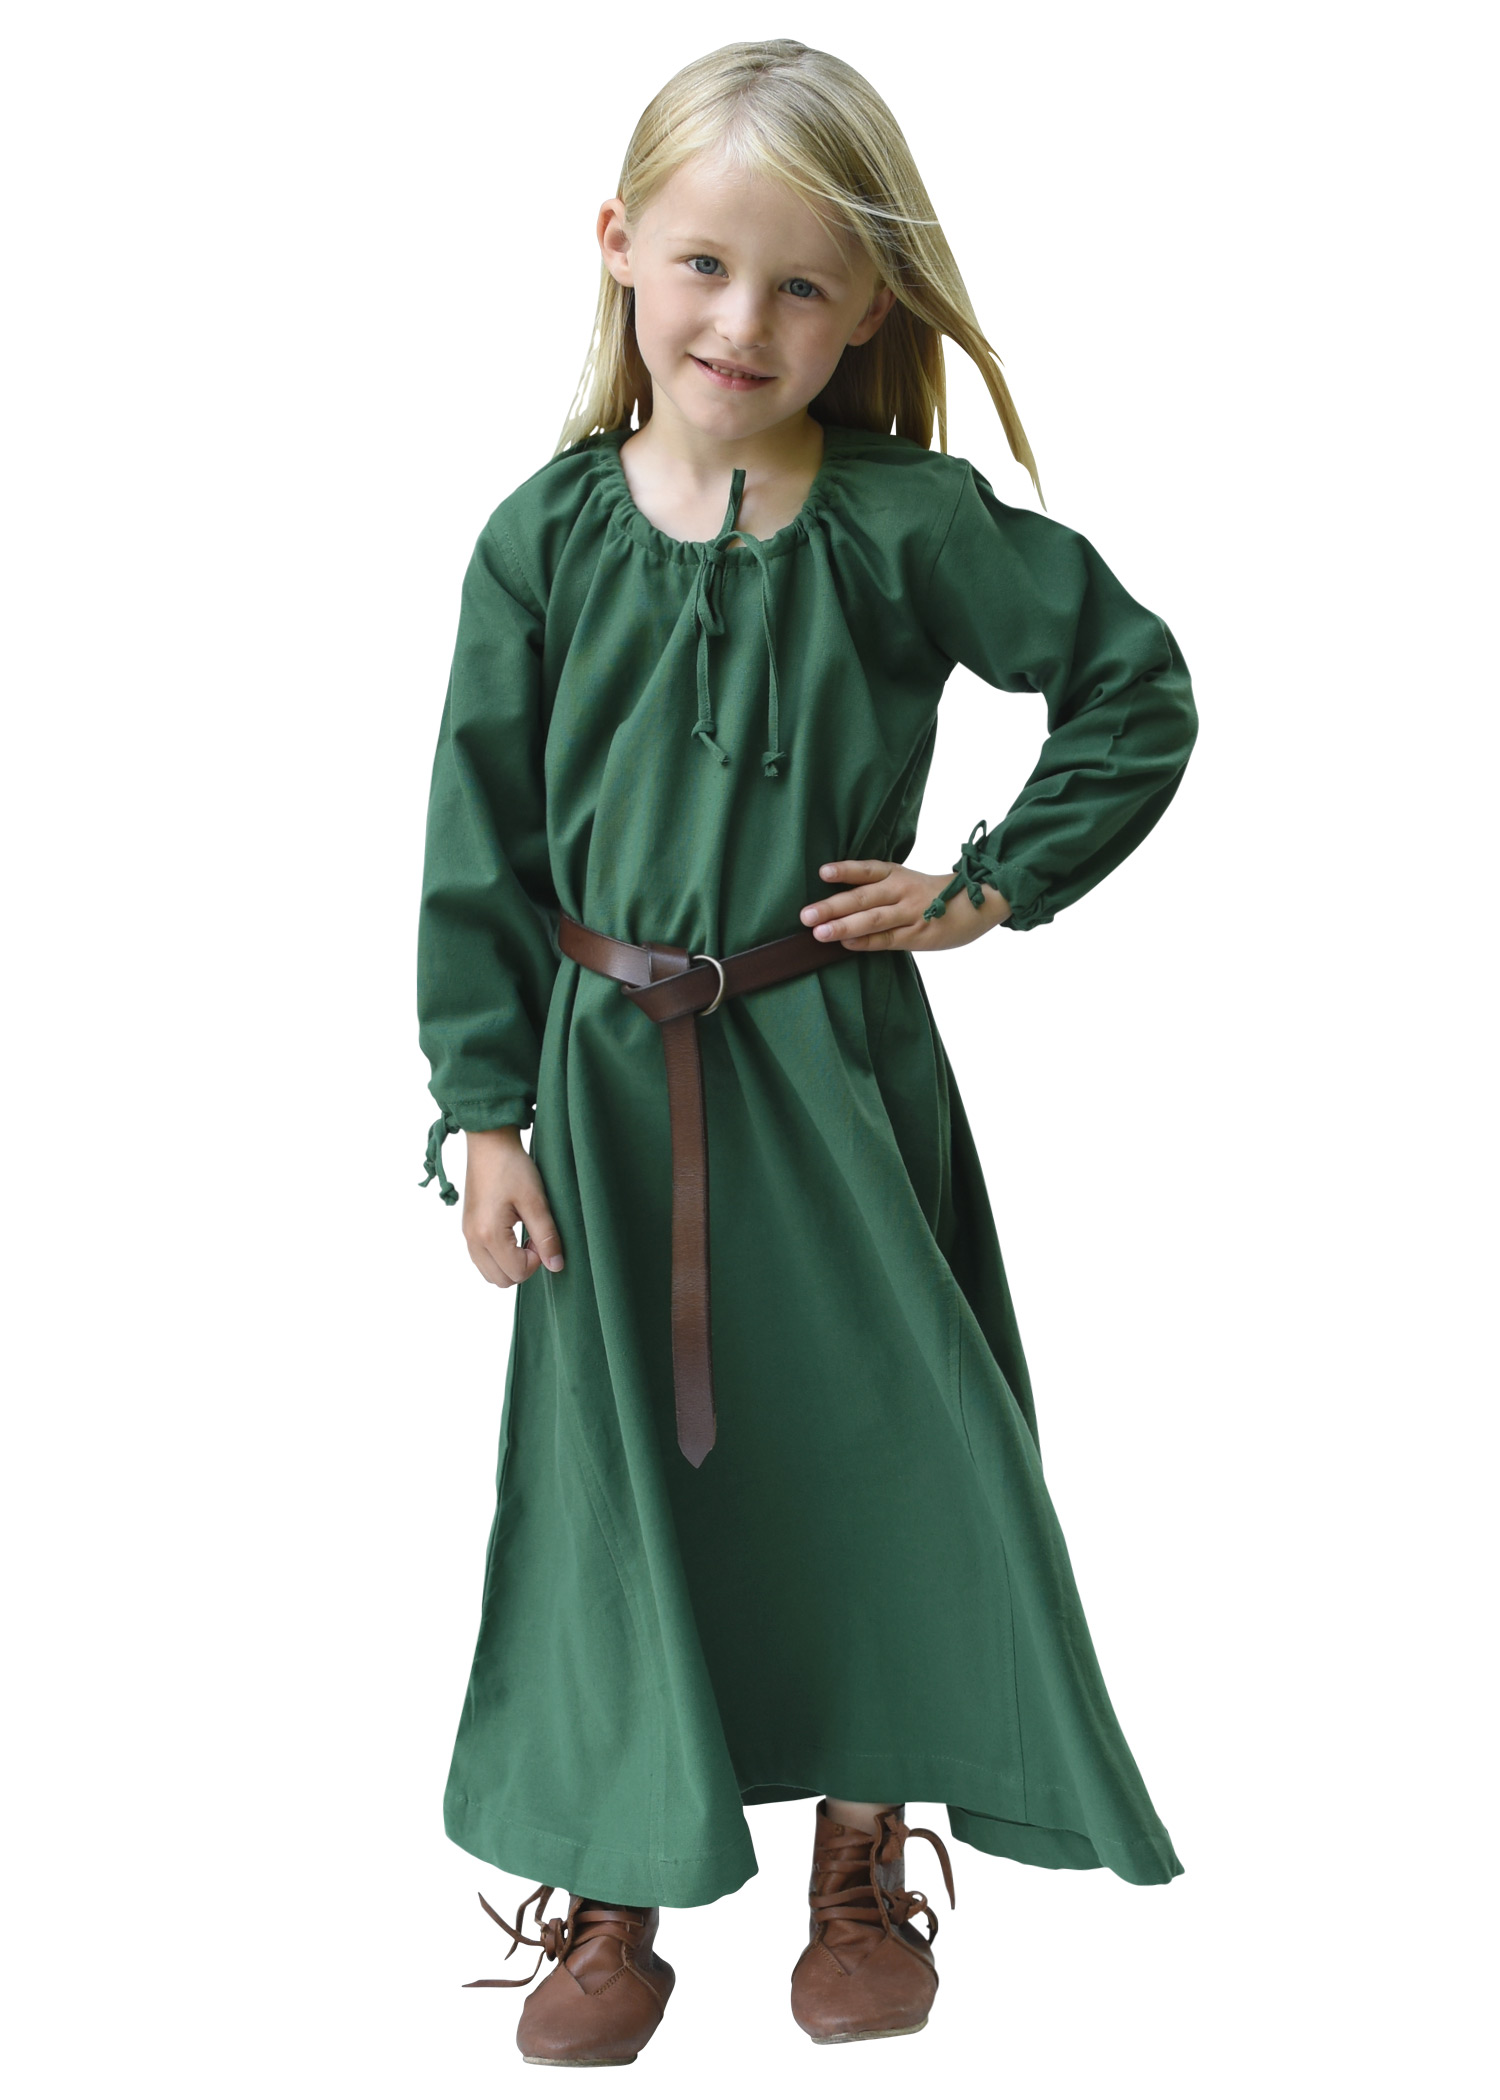 Kinder Mittelalterkleid Ana, grün